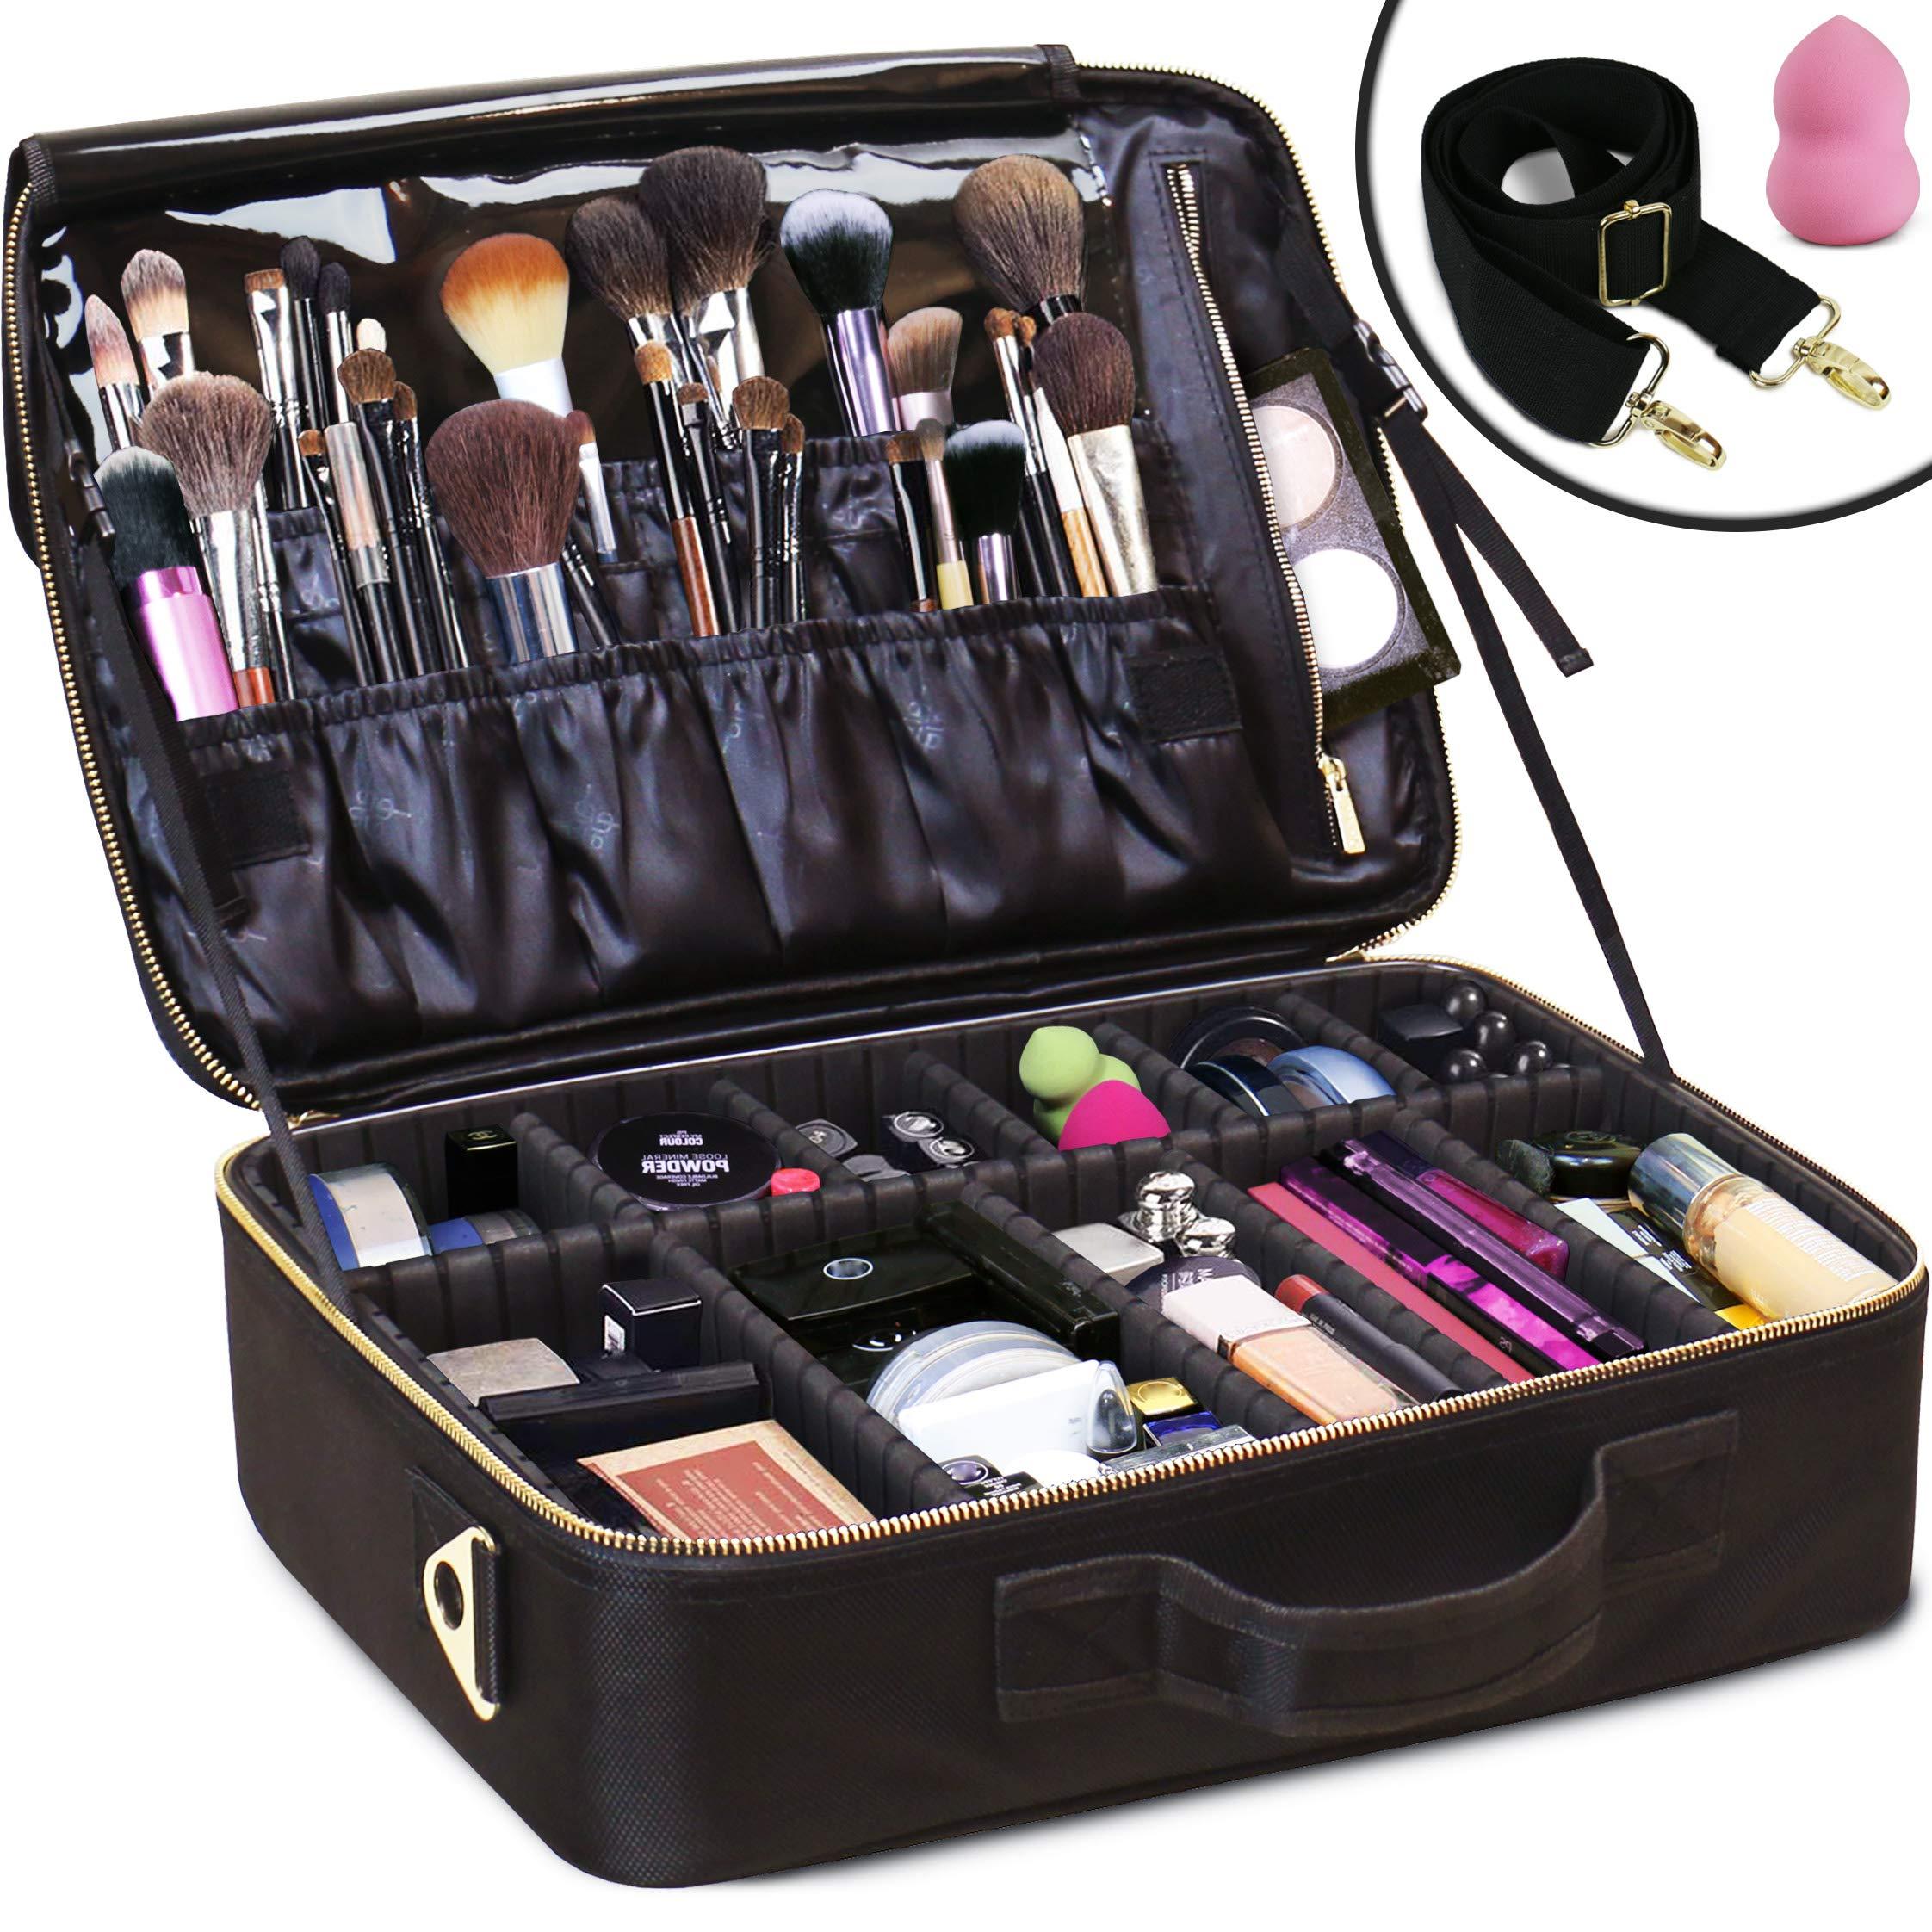 Daniel Harris Makeup Bag/Cosmetic bag   Makeup Case with Adjustable Dividers   Use as Travel Make up Bag Organizer  Portable + Water-Resistant Makeup Bags for Women + Free Makeup Sponge. (LARGE) by Daniel Harris